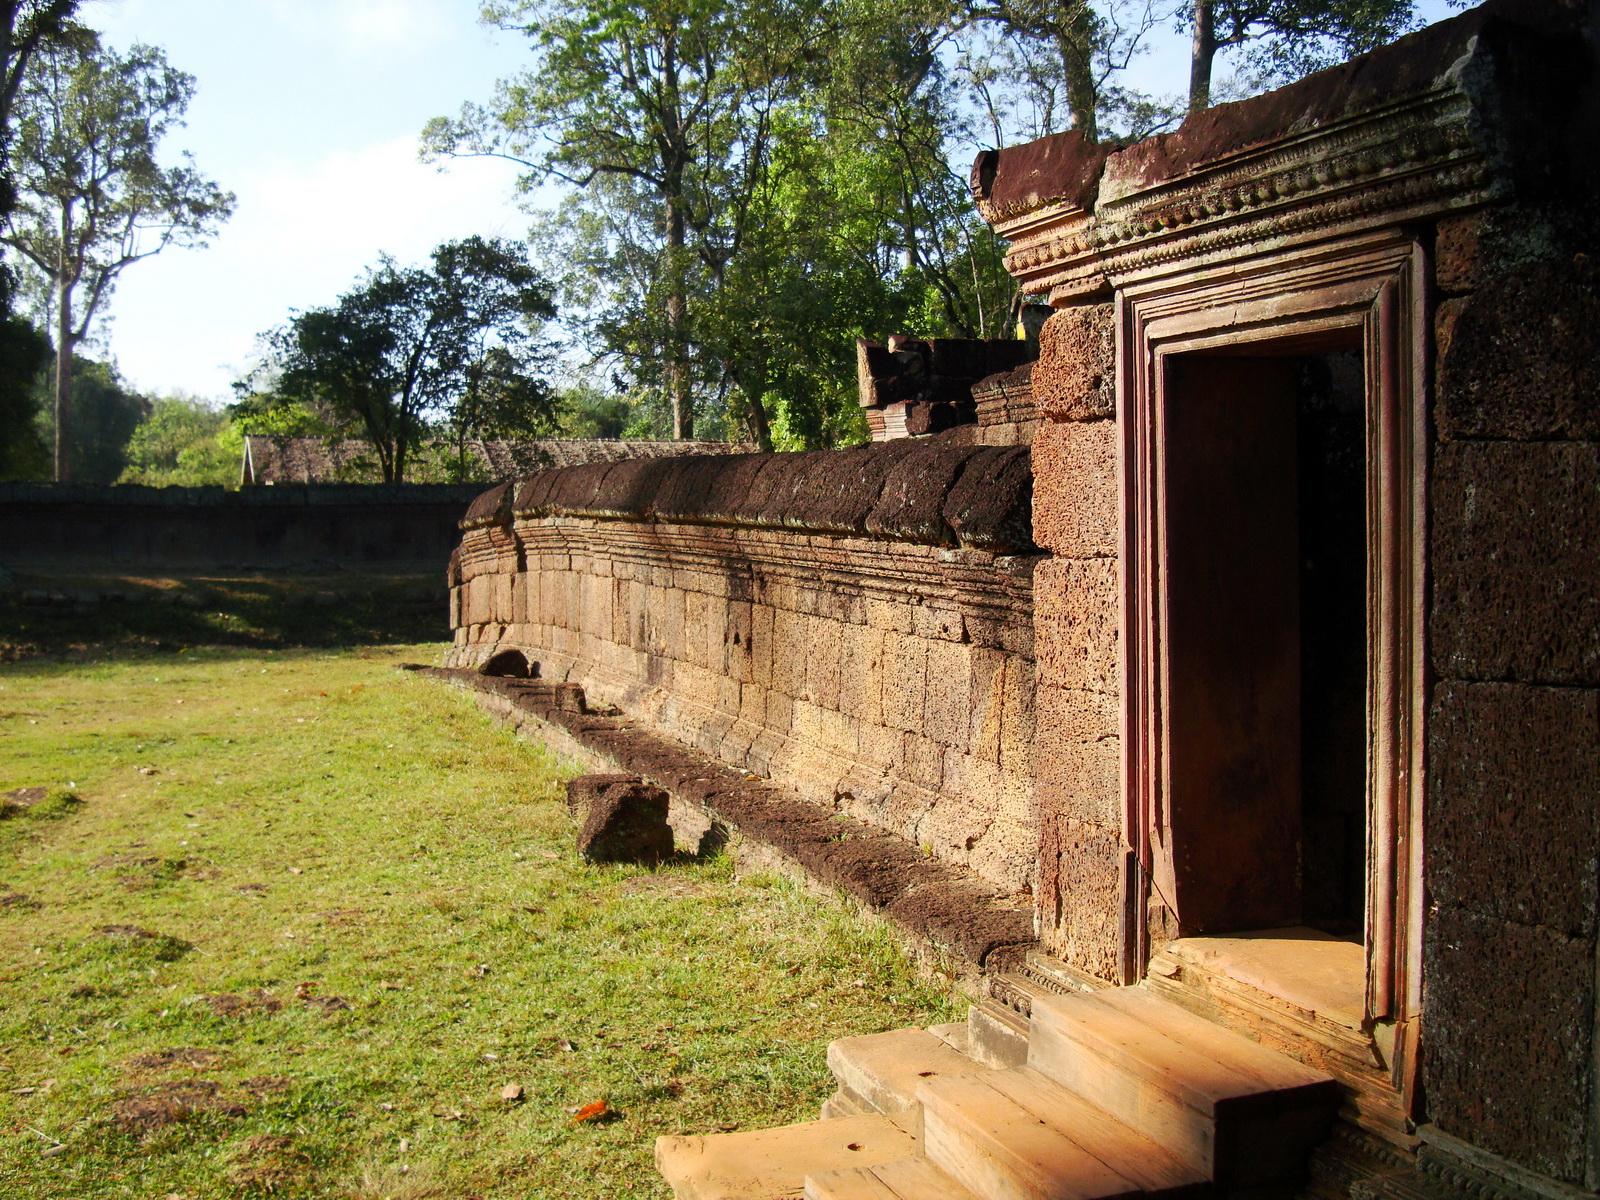 Banteay Srei Temple 10th century architecture laterite walls 01